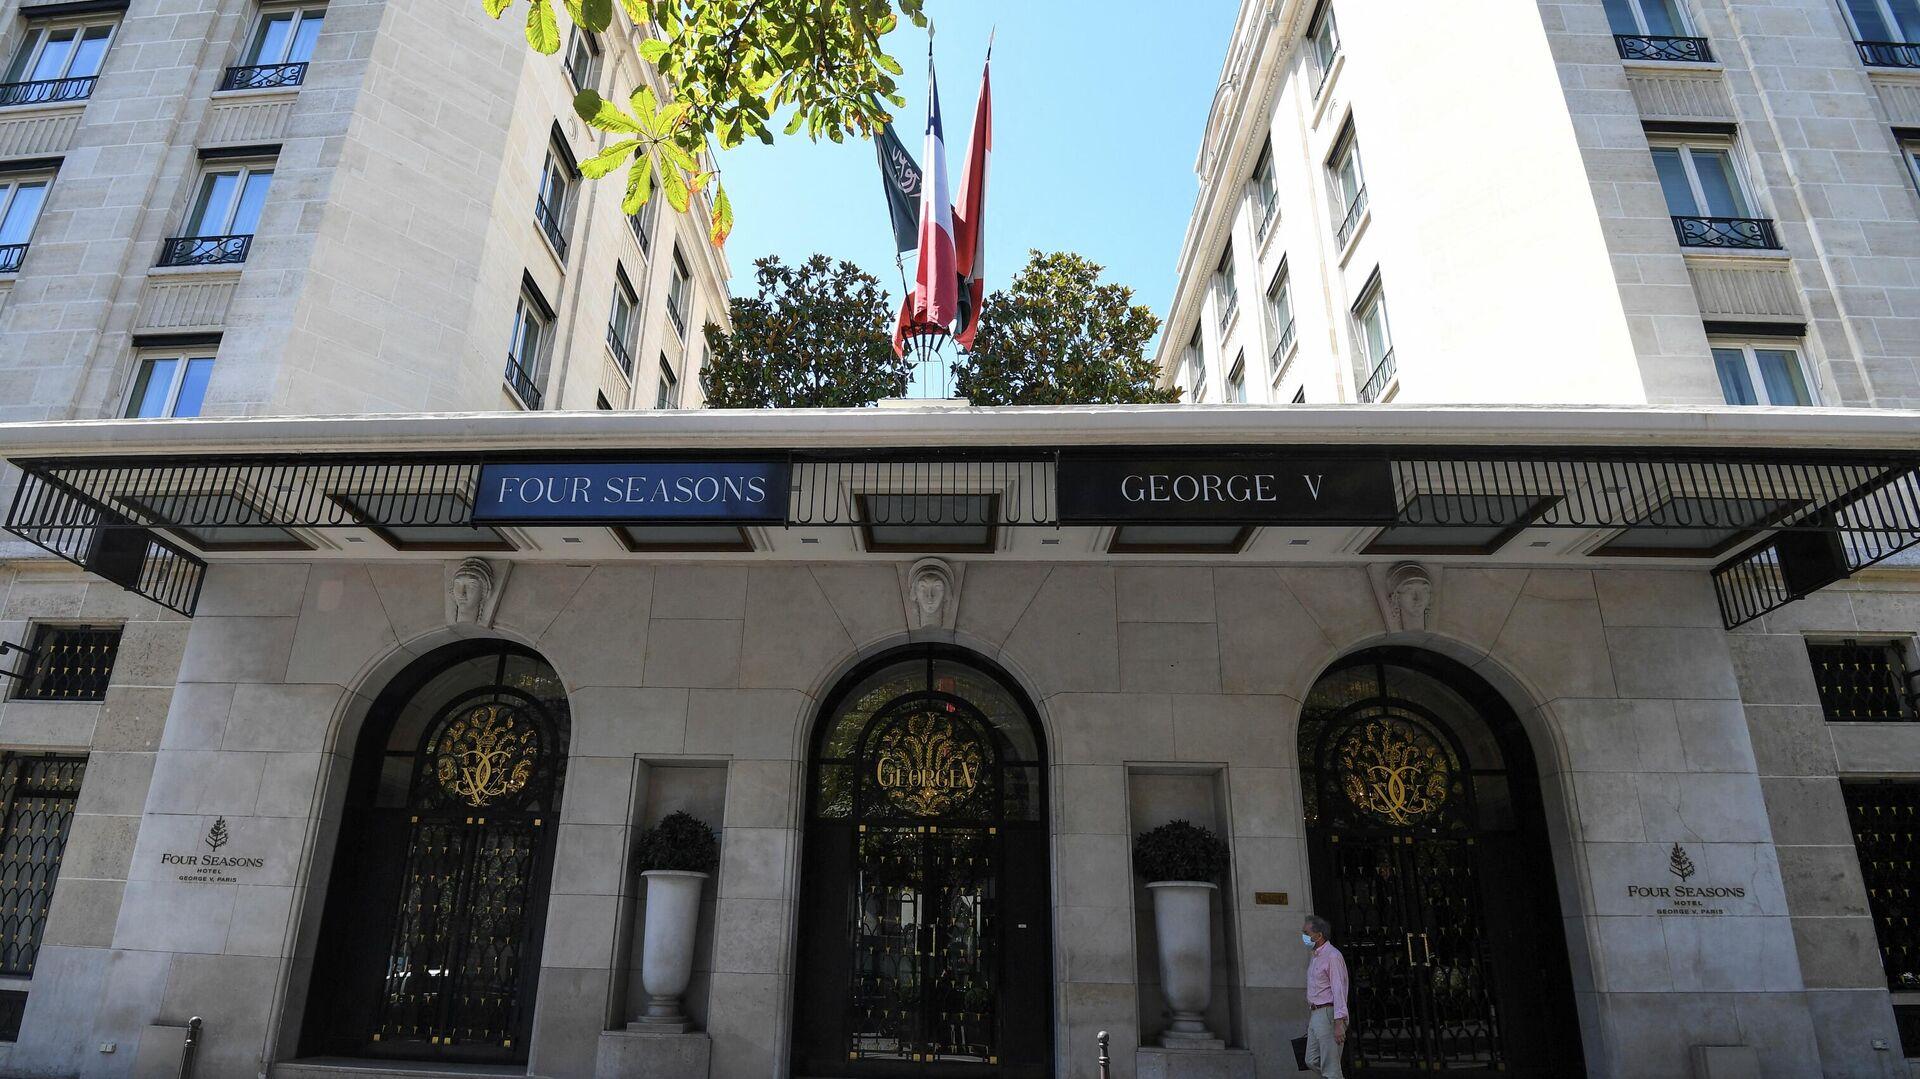 Hotel Four Seasons en París, Francia - Sputnik Mundo, 1920, 09.09.2021